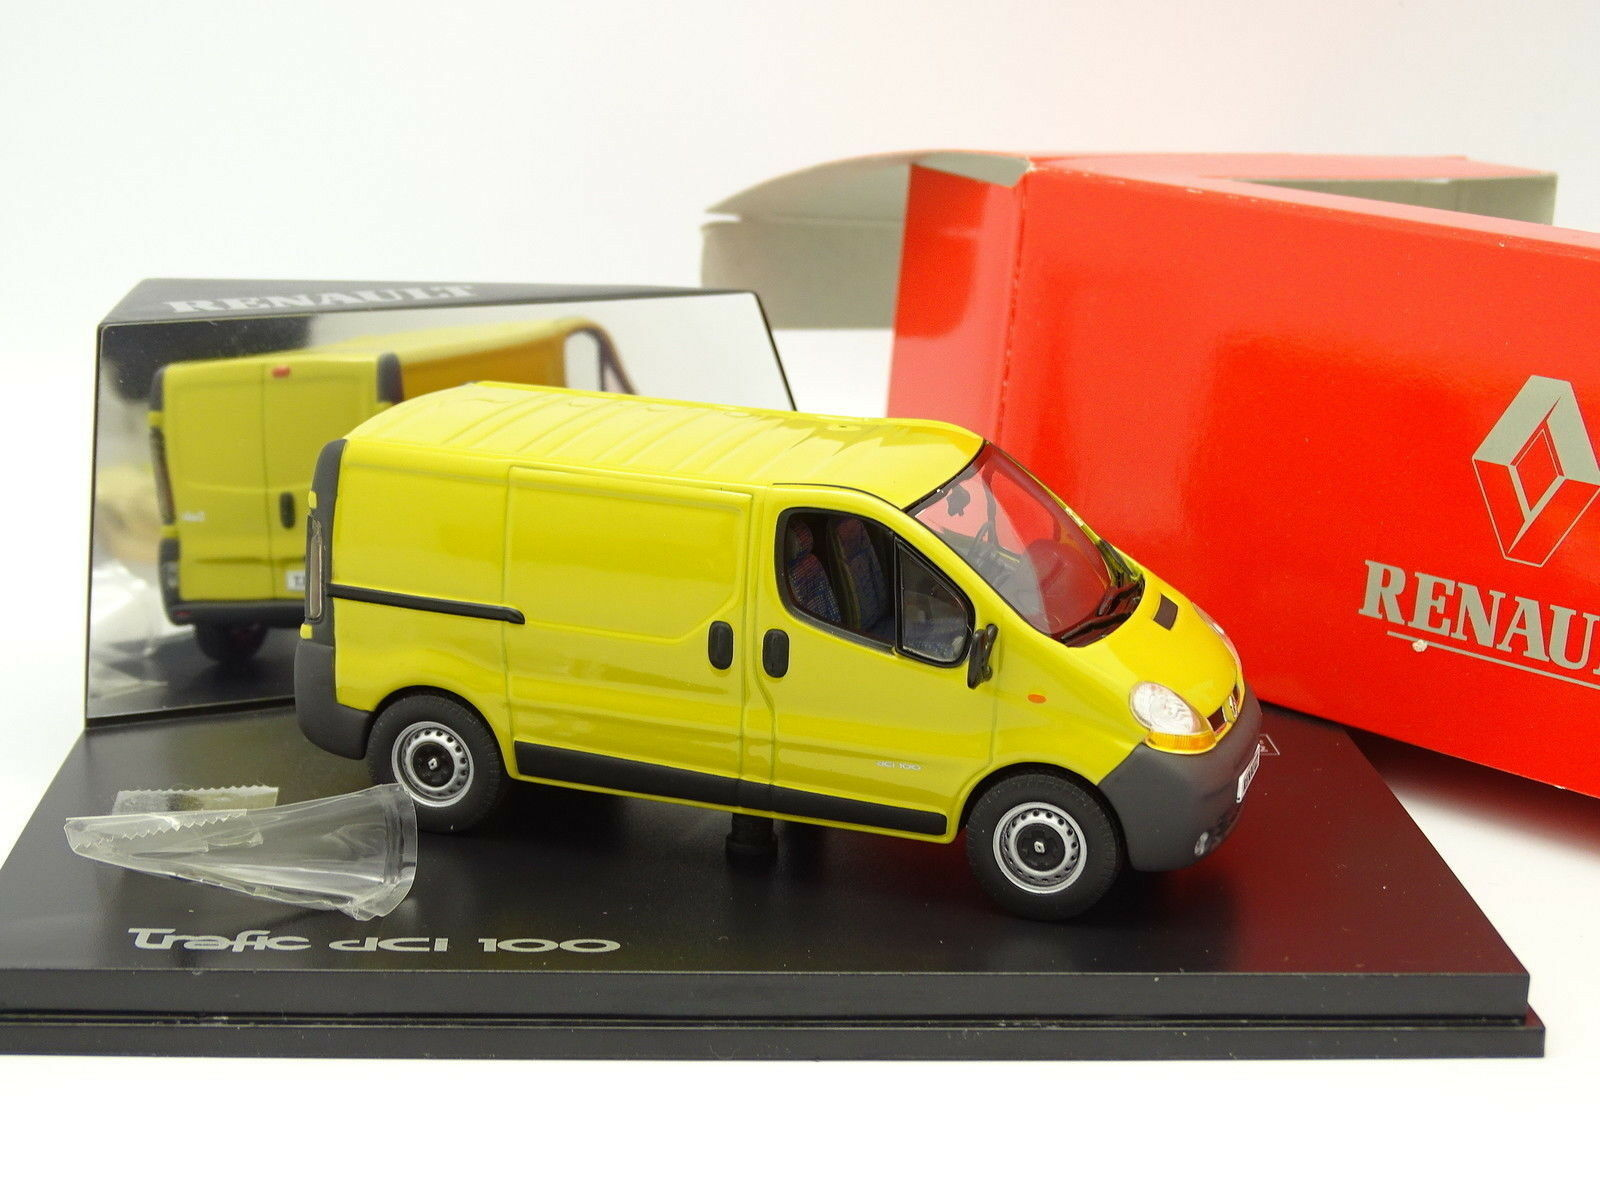 Norev 1 43 - Renault Traffic DCI 100 Combi Yellow